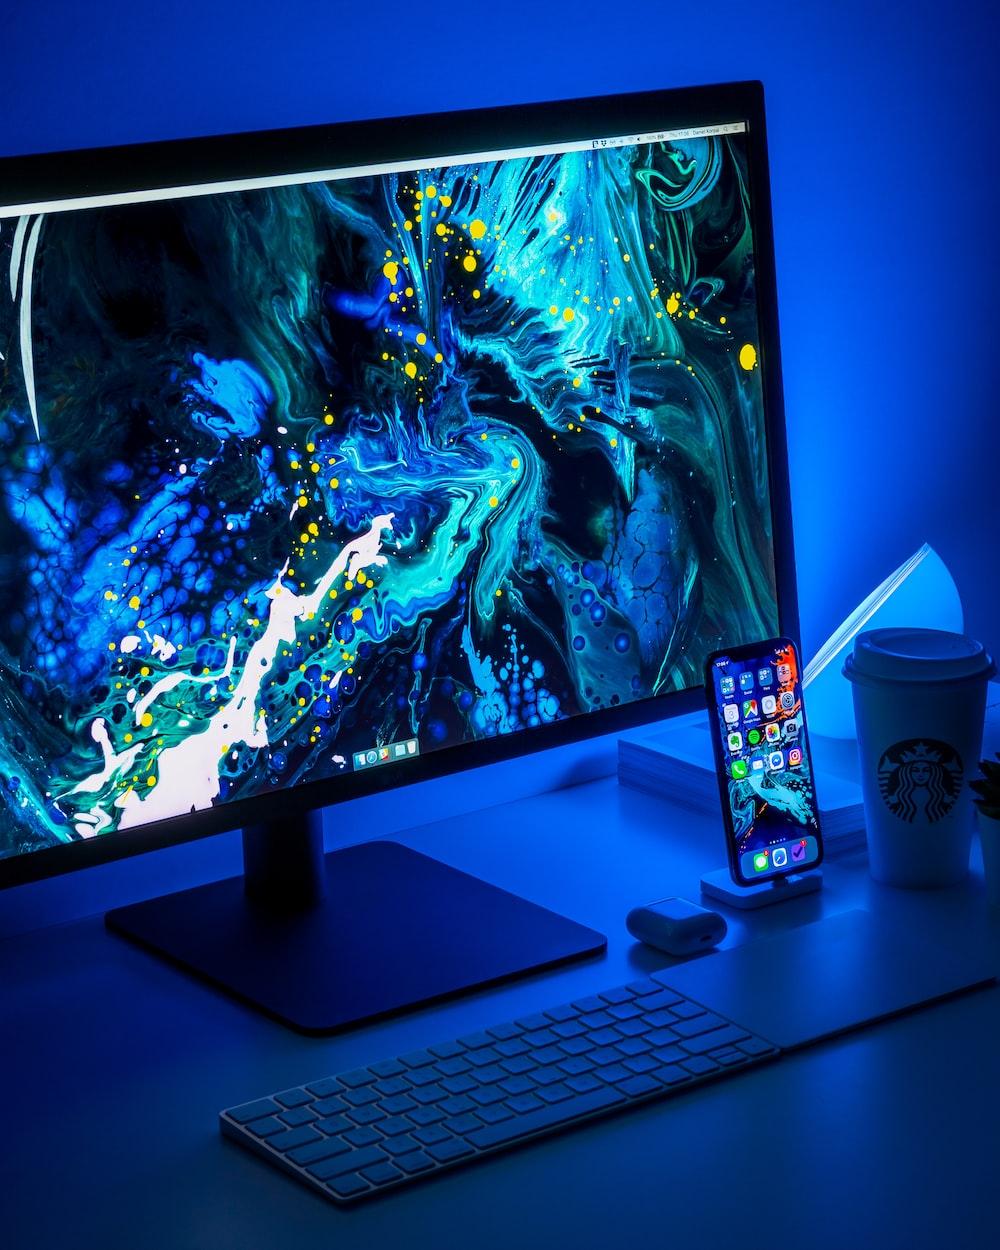 flat screen computer monitor turned on beside black keyboard